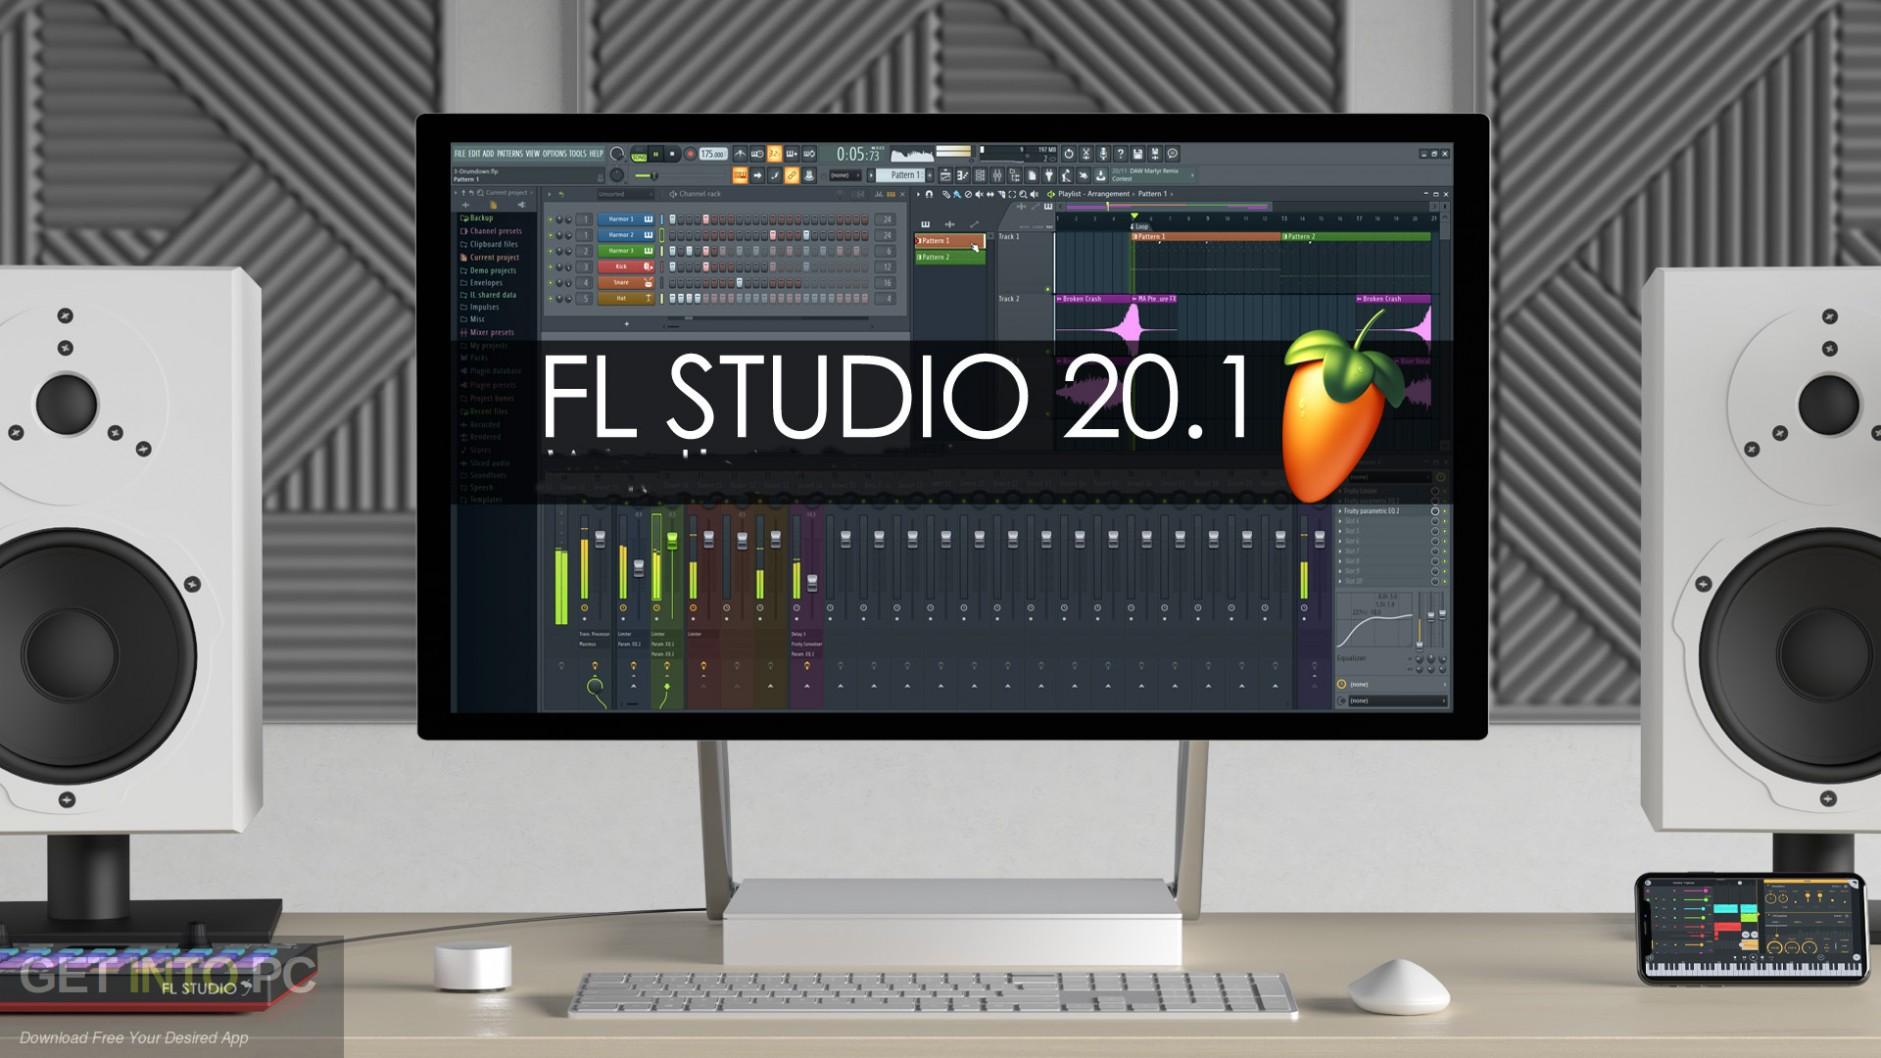 FL Studio 20.1.1 Jan 2019 Free Download-GetintoPC.com